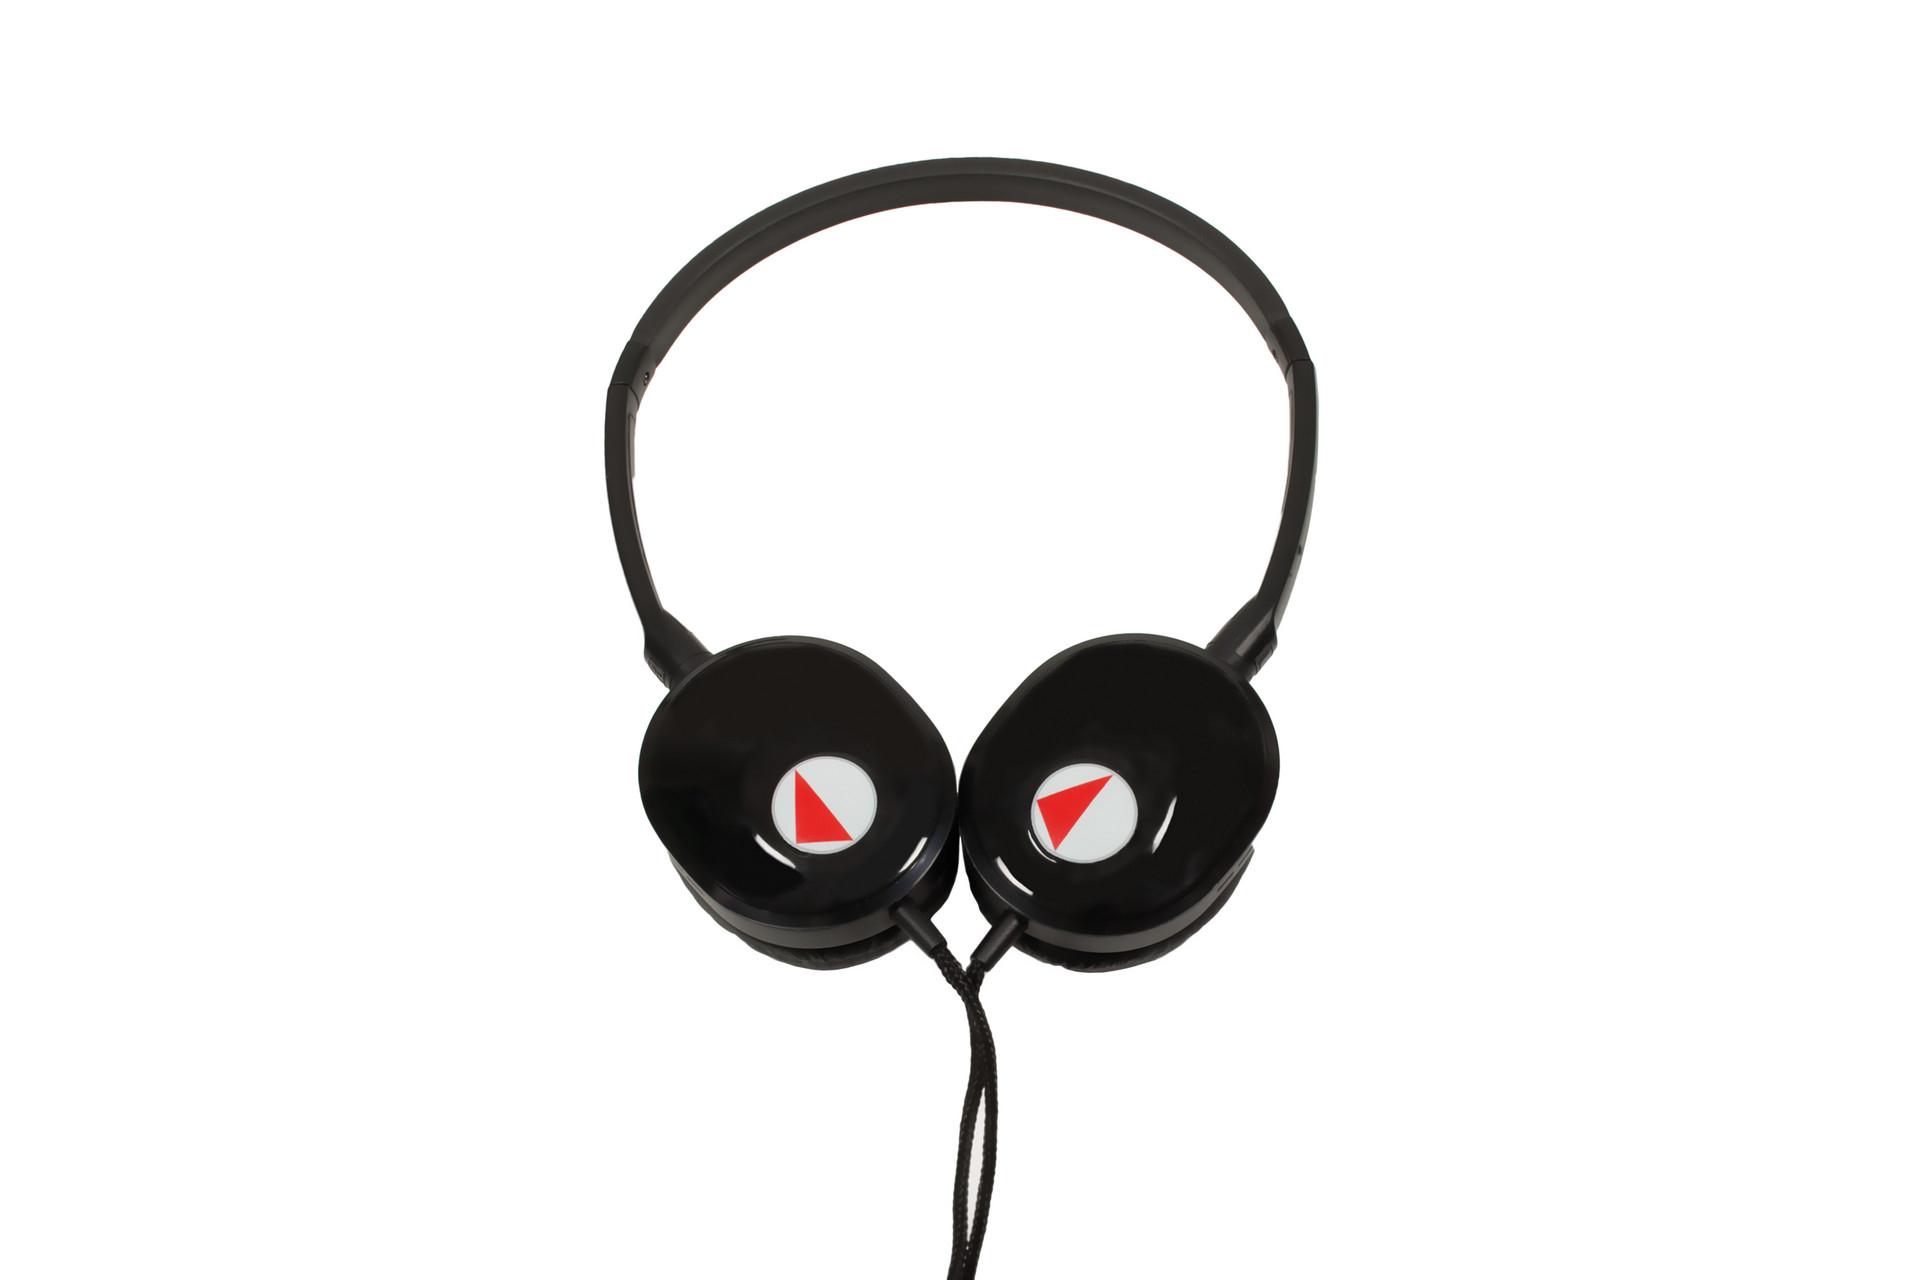 ProJect Project Hear it 2 Pro-Ject Hear It 2 Red - headphone